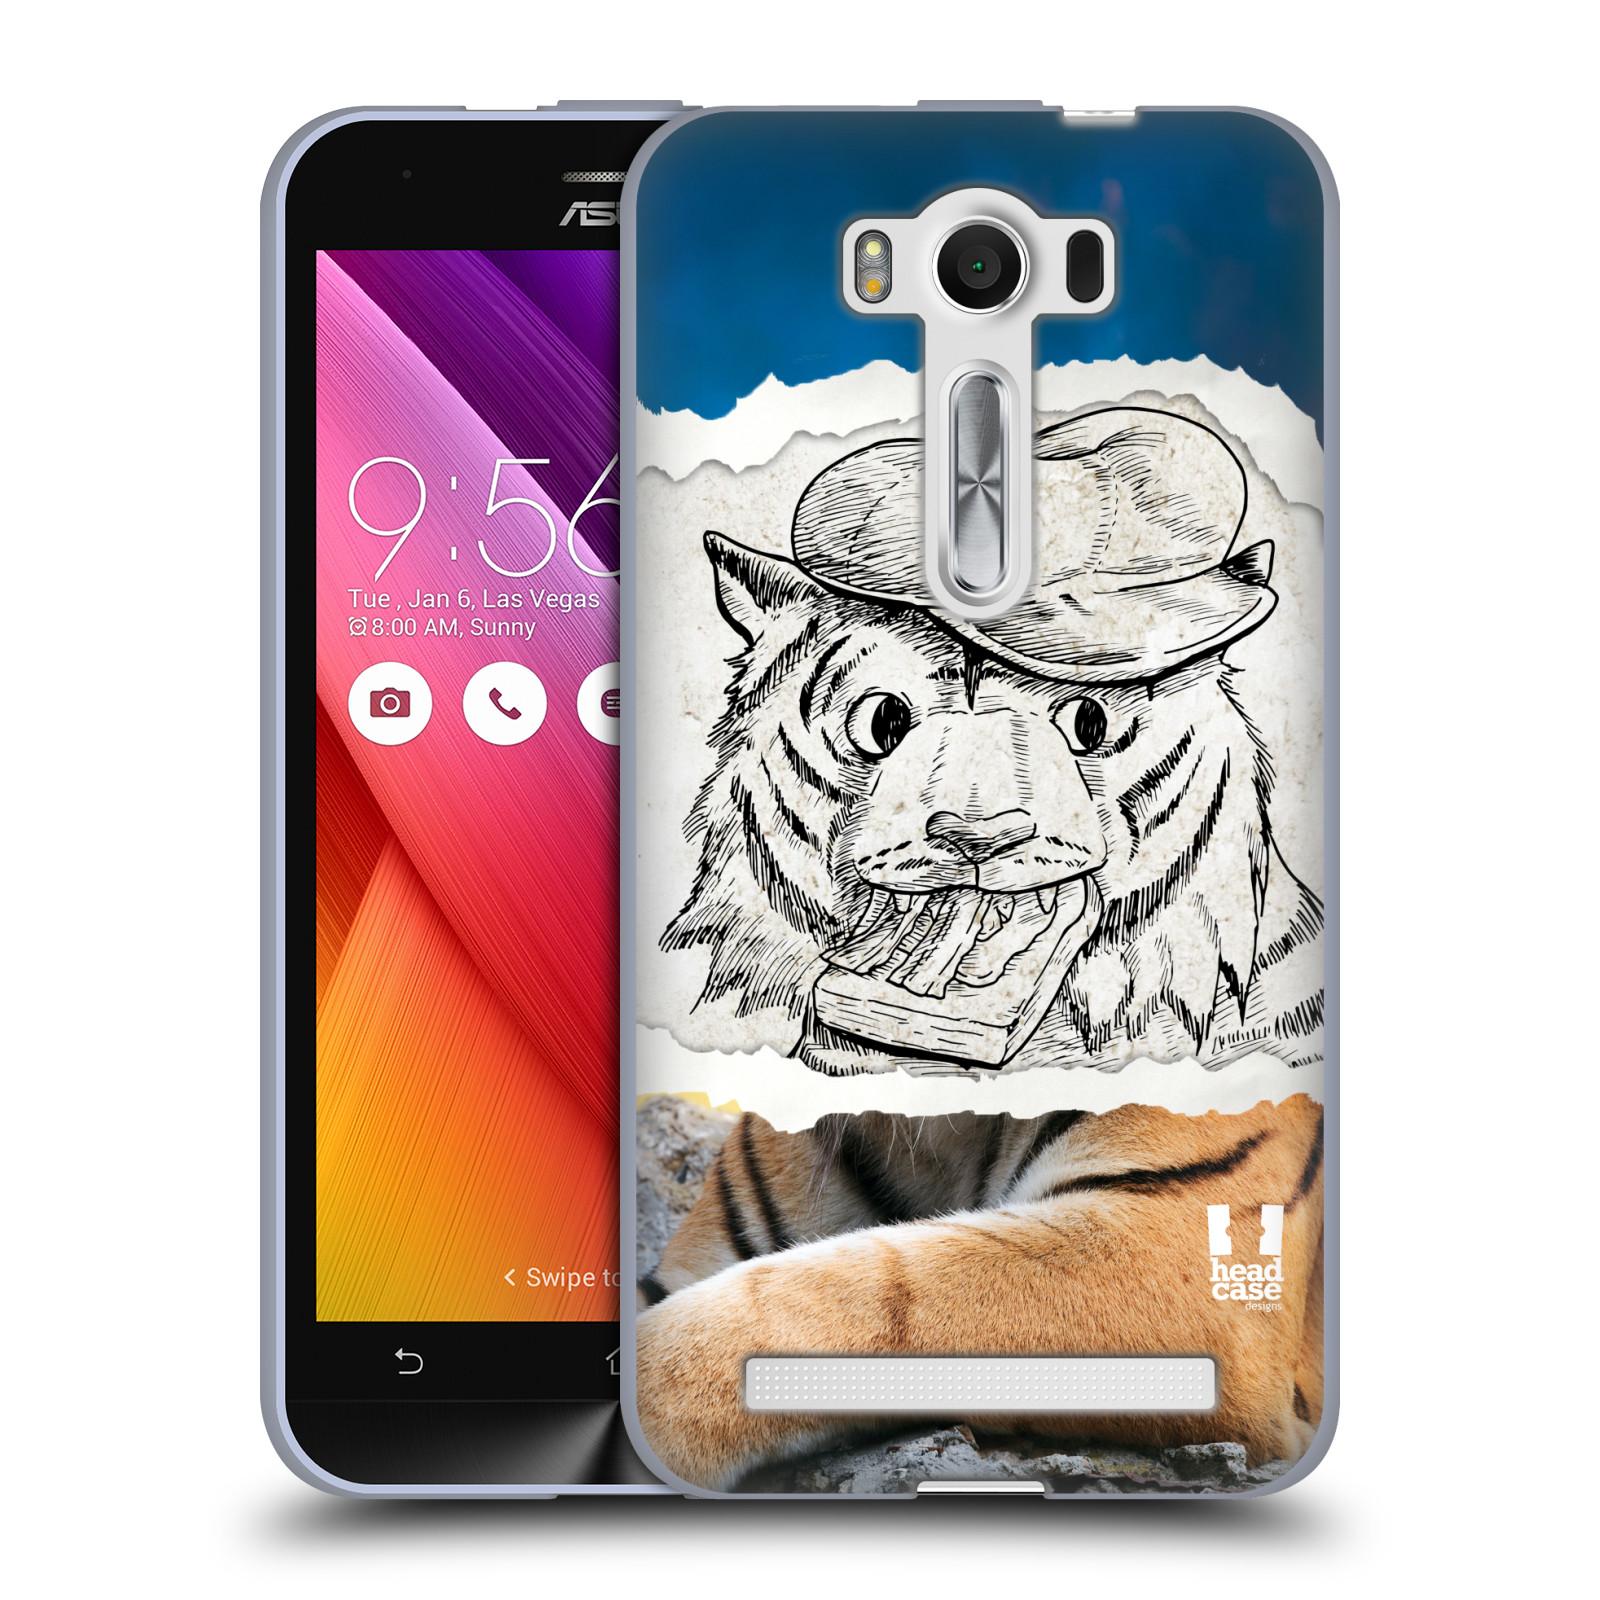 "HEAD CASE silikonový obal na mobil Asus Zenfone 2 LASER (ZE500KL s 5"" displejem) vzor zvířata koláž tygr fešák"